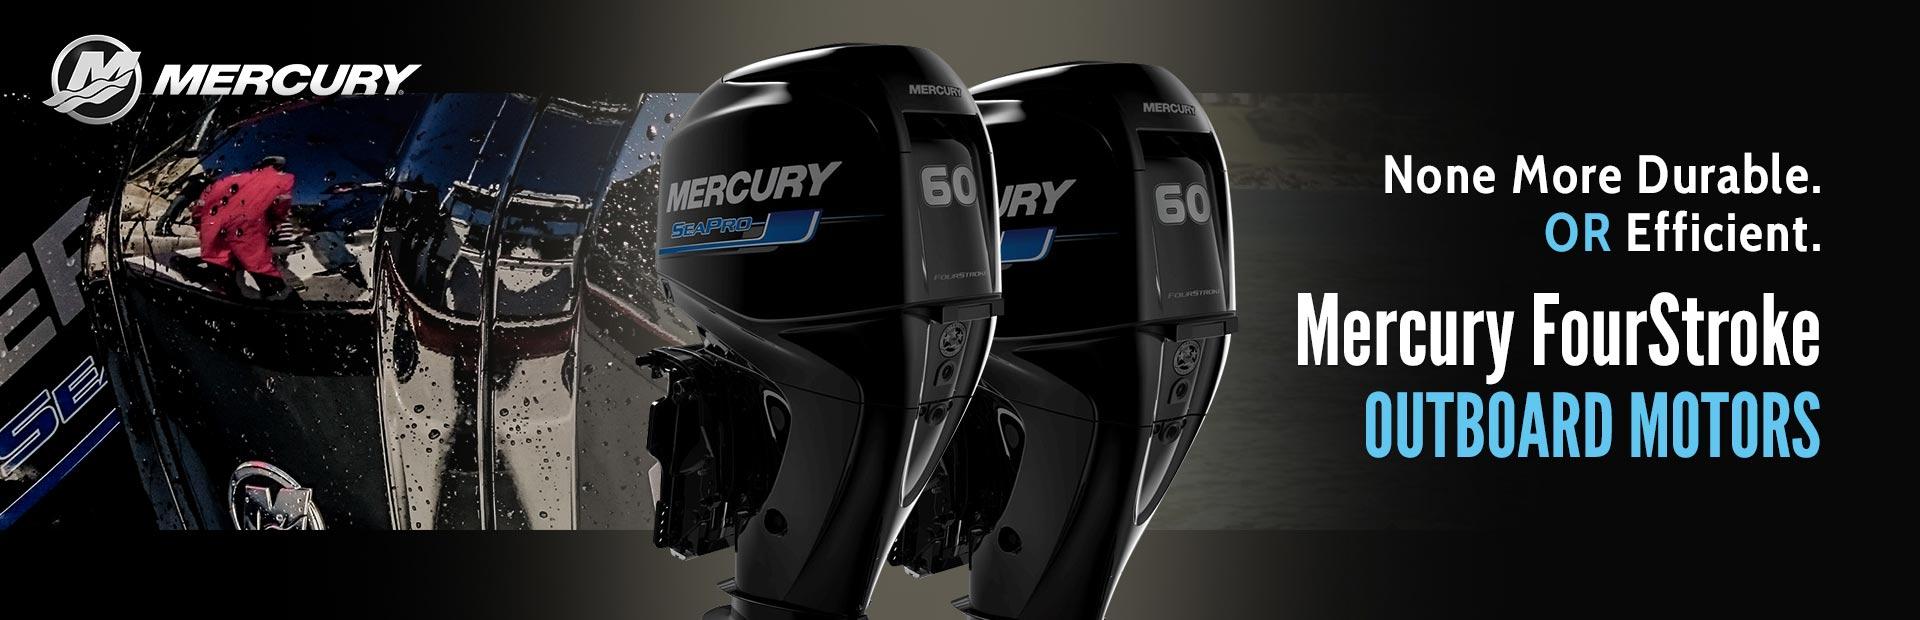 Mercury boat engine